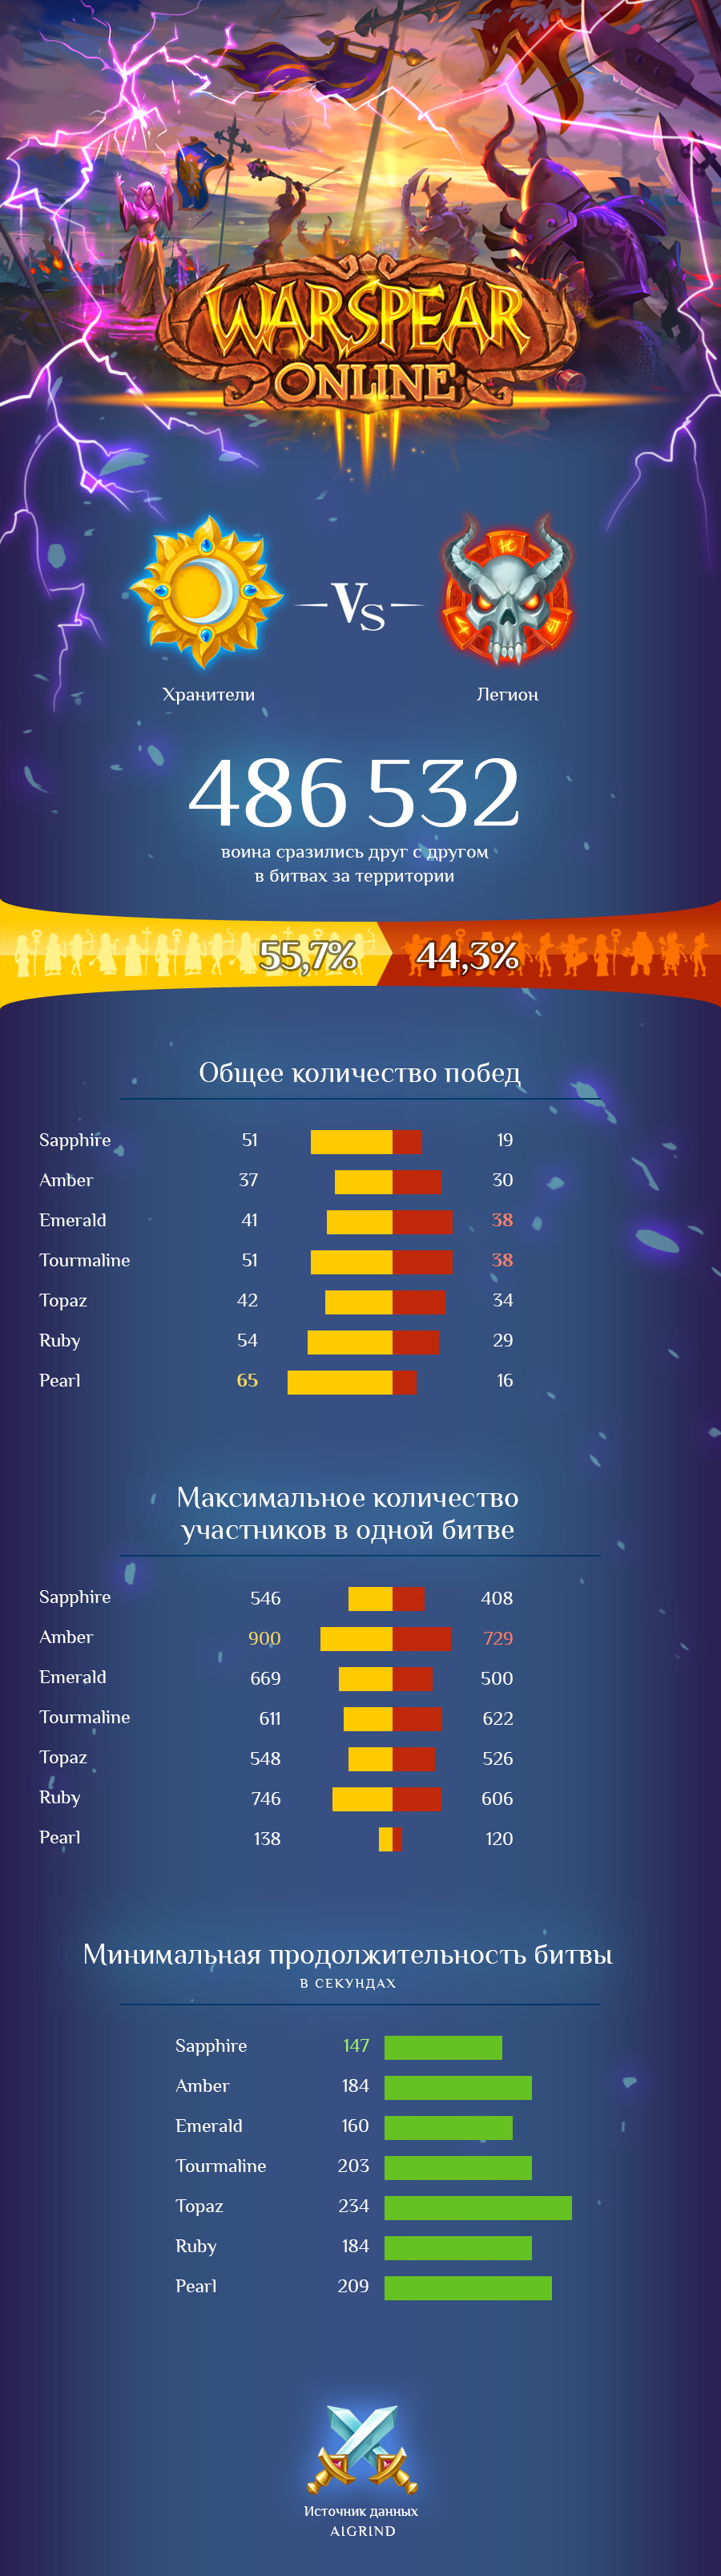 100battle_ru.png